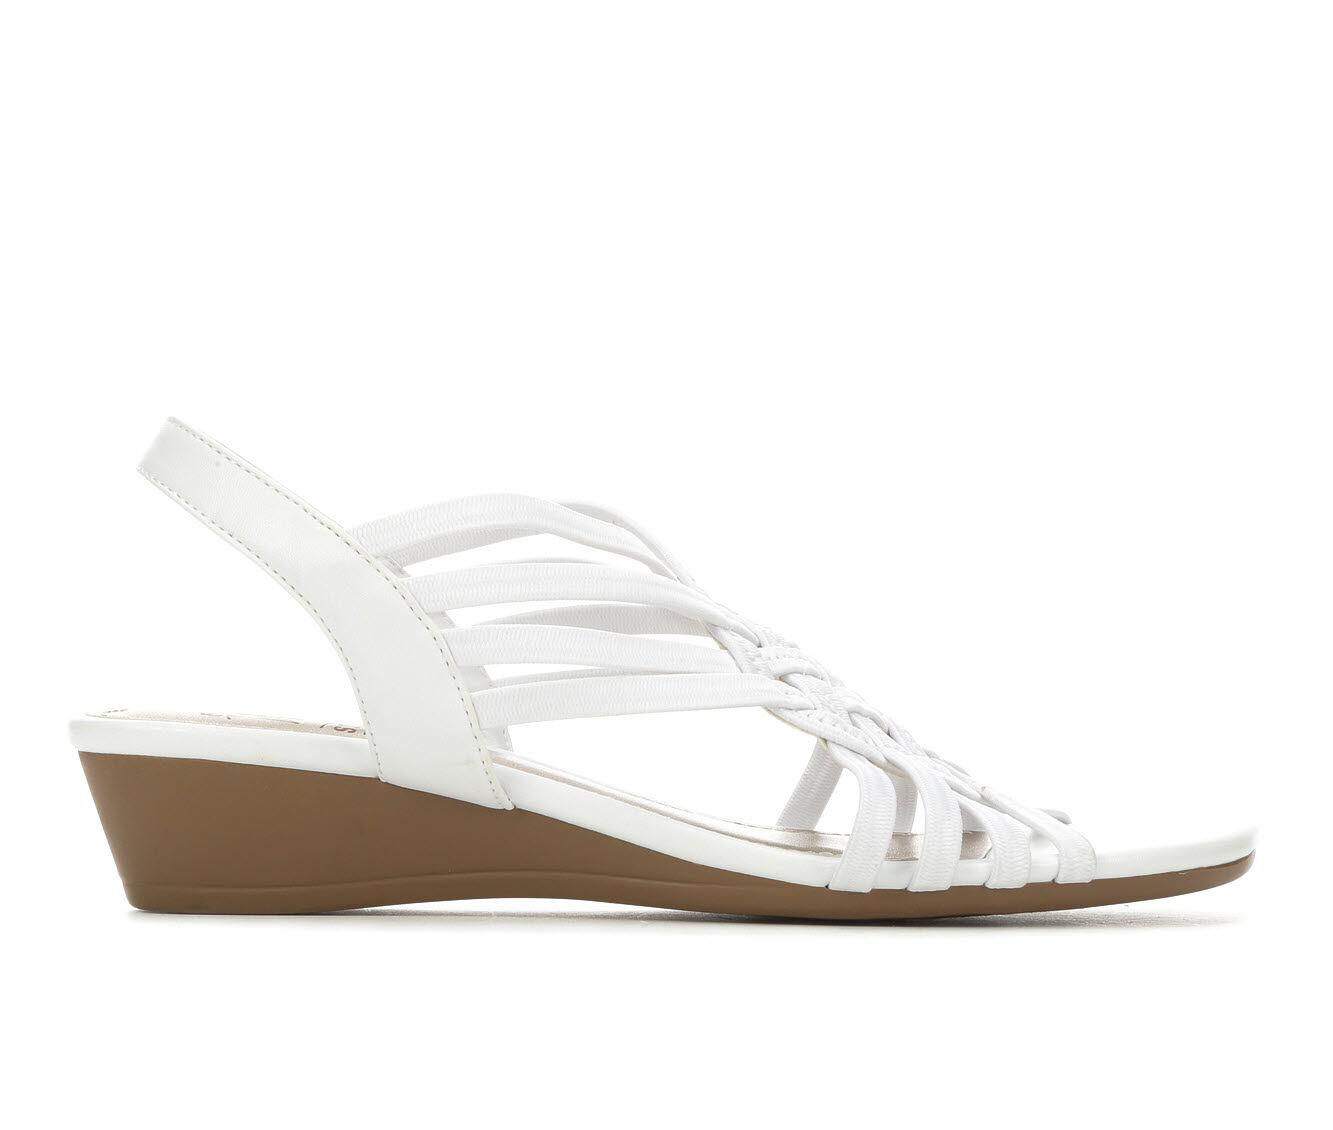 buy coupon Women's Impo Rosia Strappy Sandals White